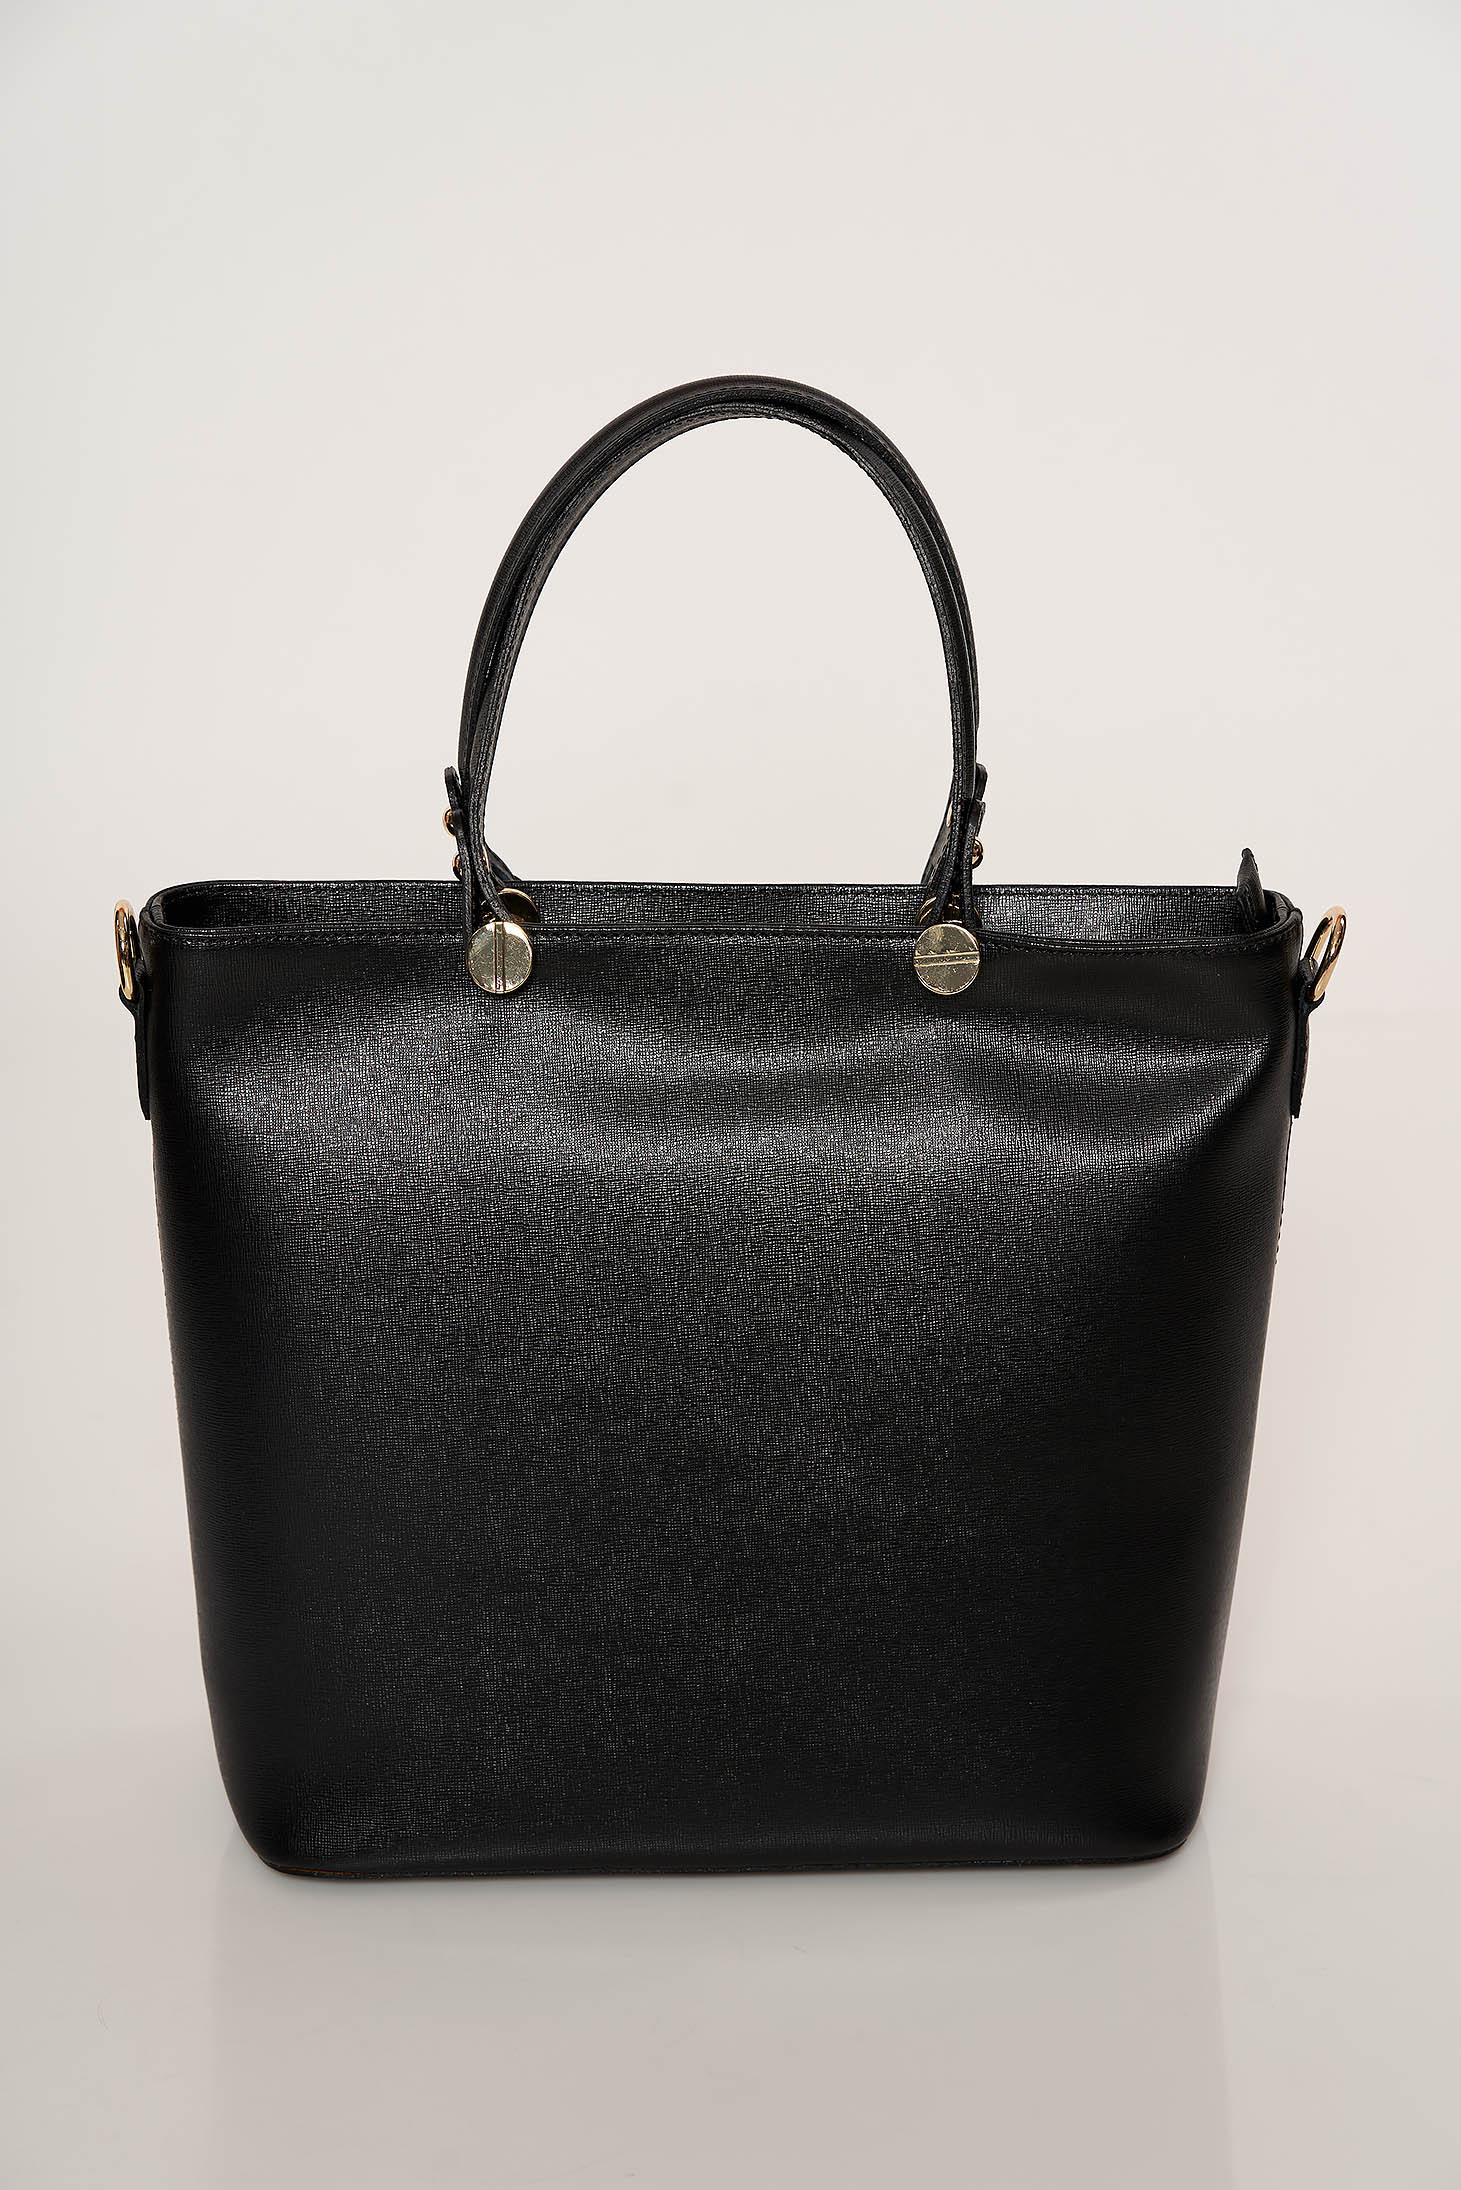 Geanta dama neagra eleganta din piele naturala cu doua manere de lungime medie